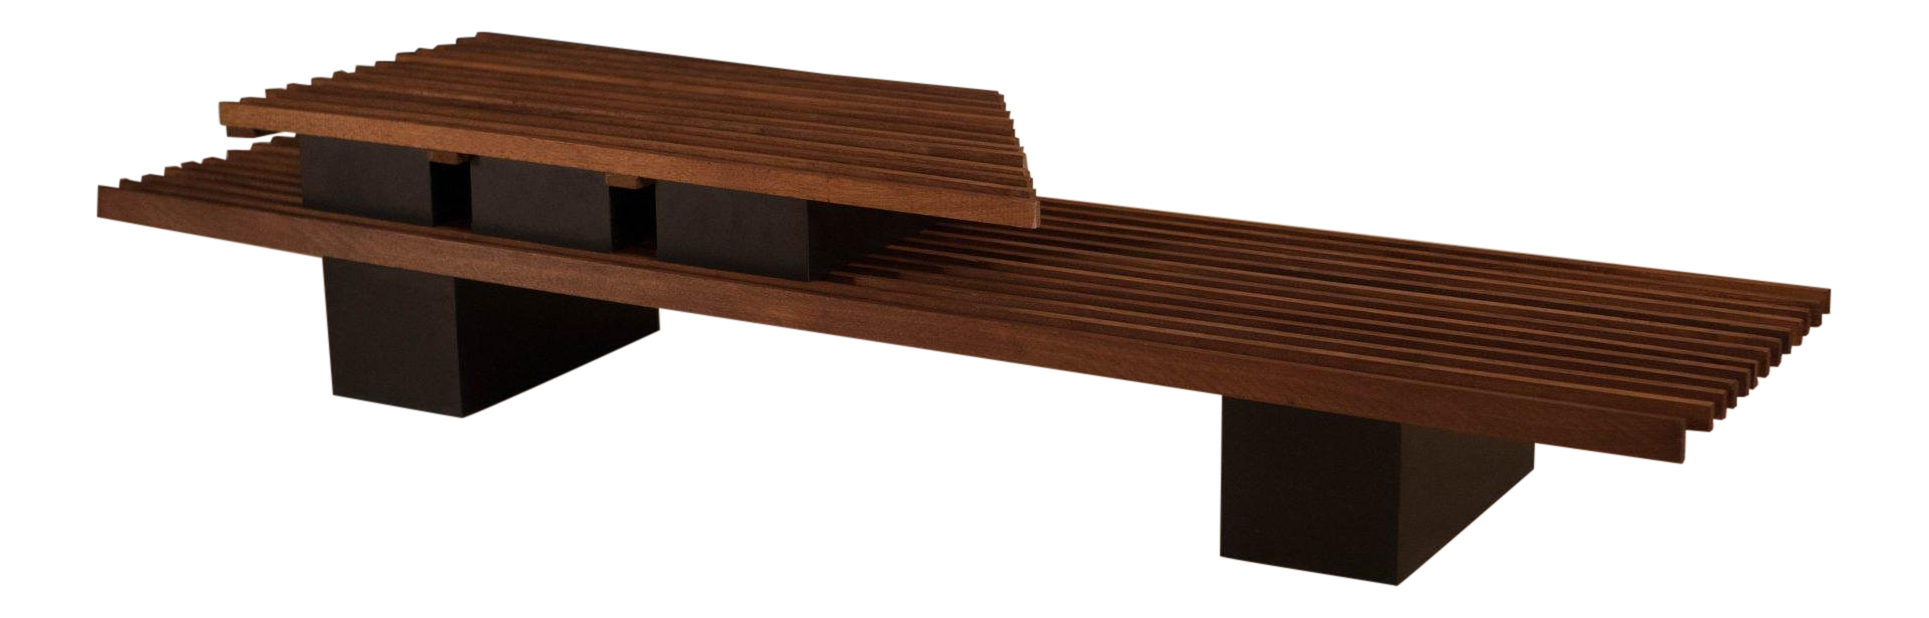 Vintage Mid Century Two Tier Studio Slat Bench / Coffee Table